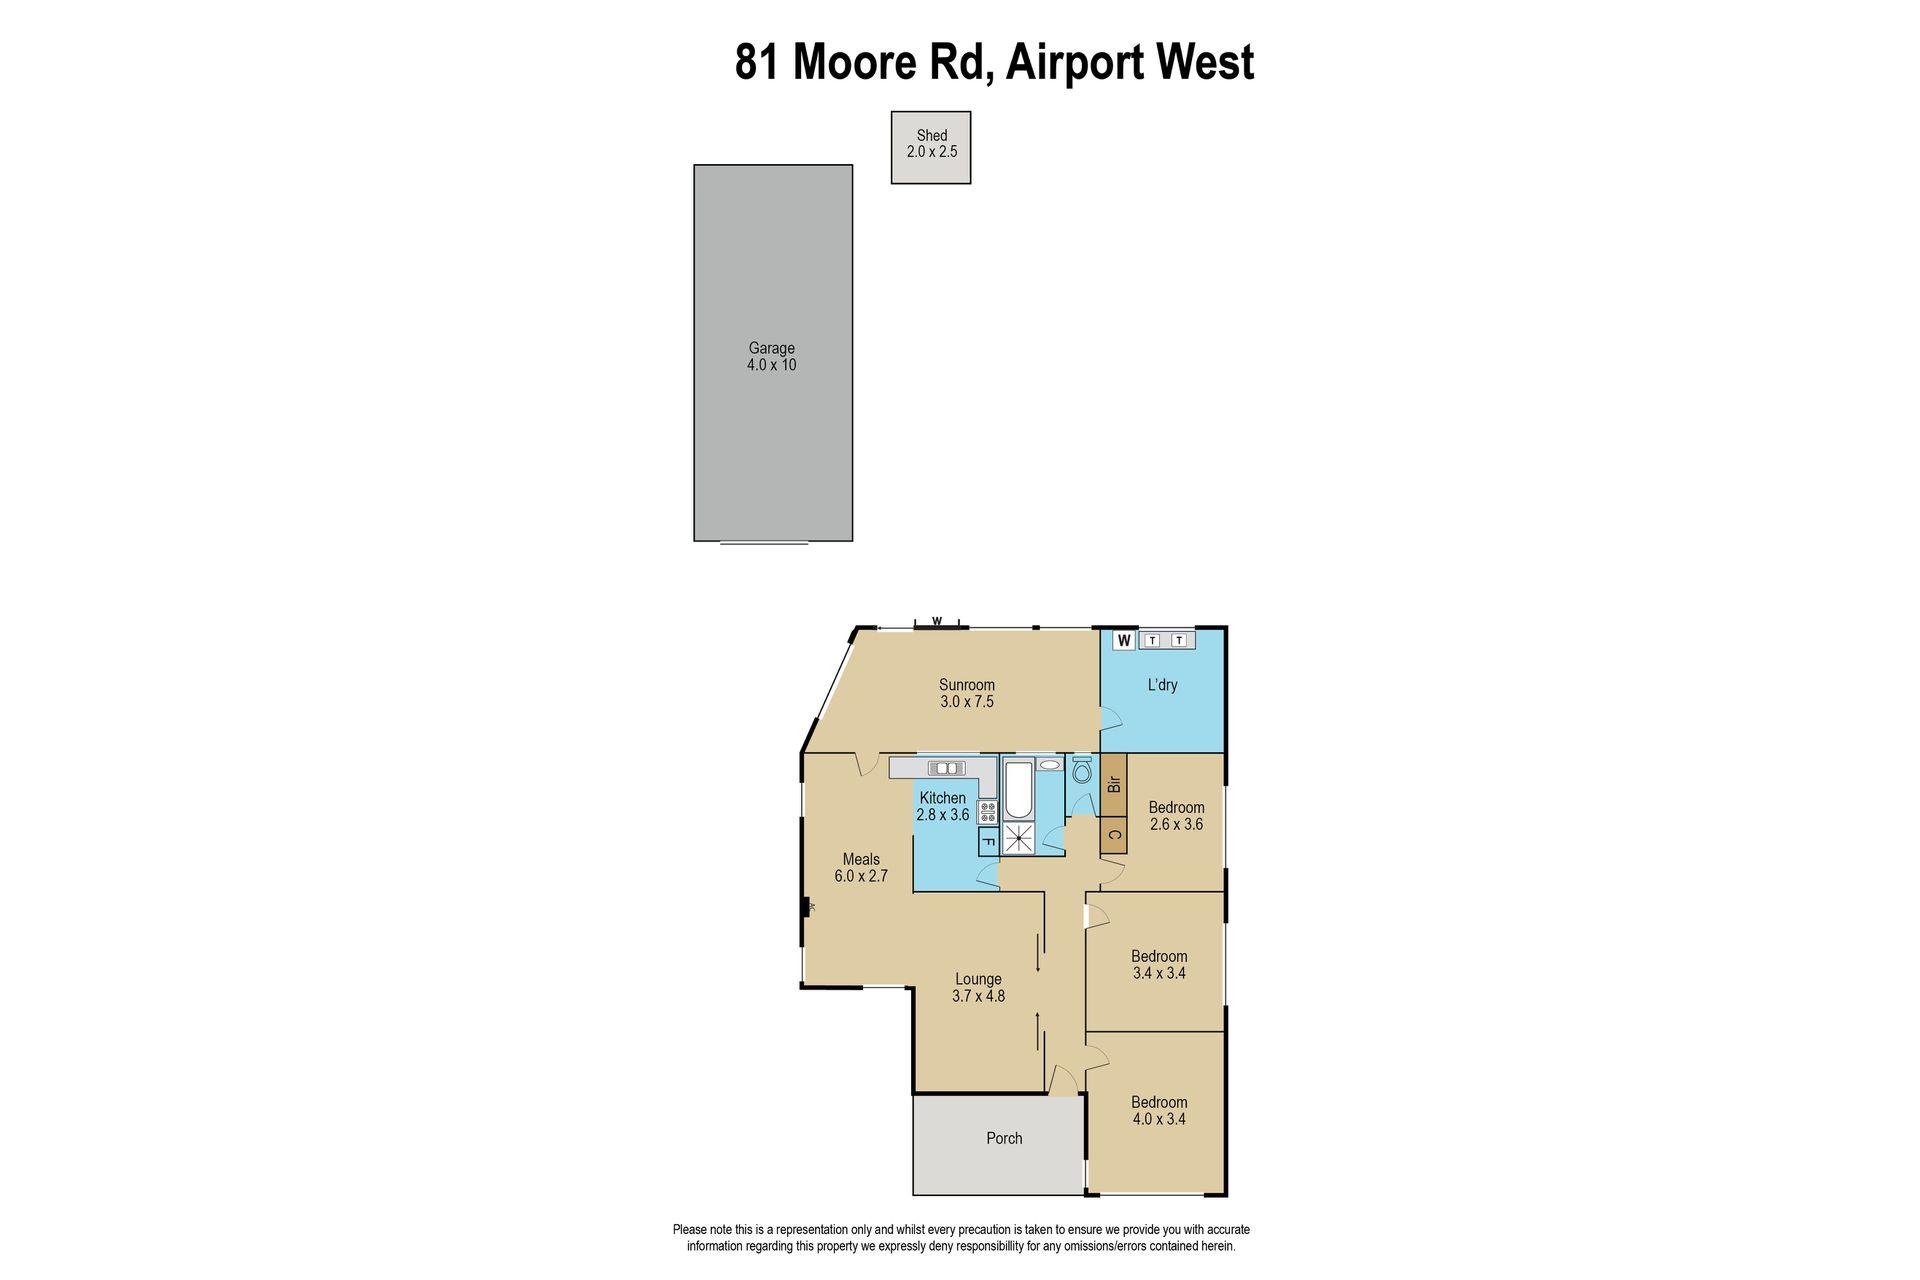 81 Moore Road, Airport West